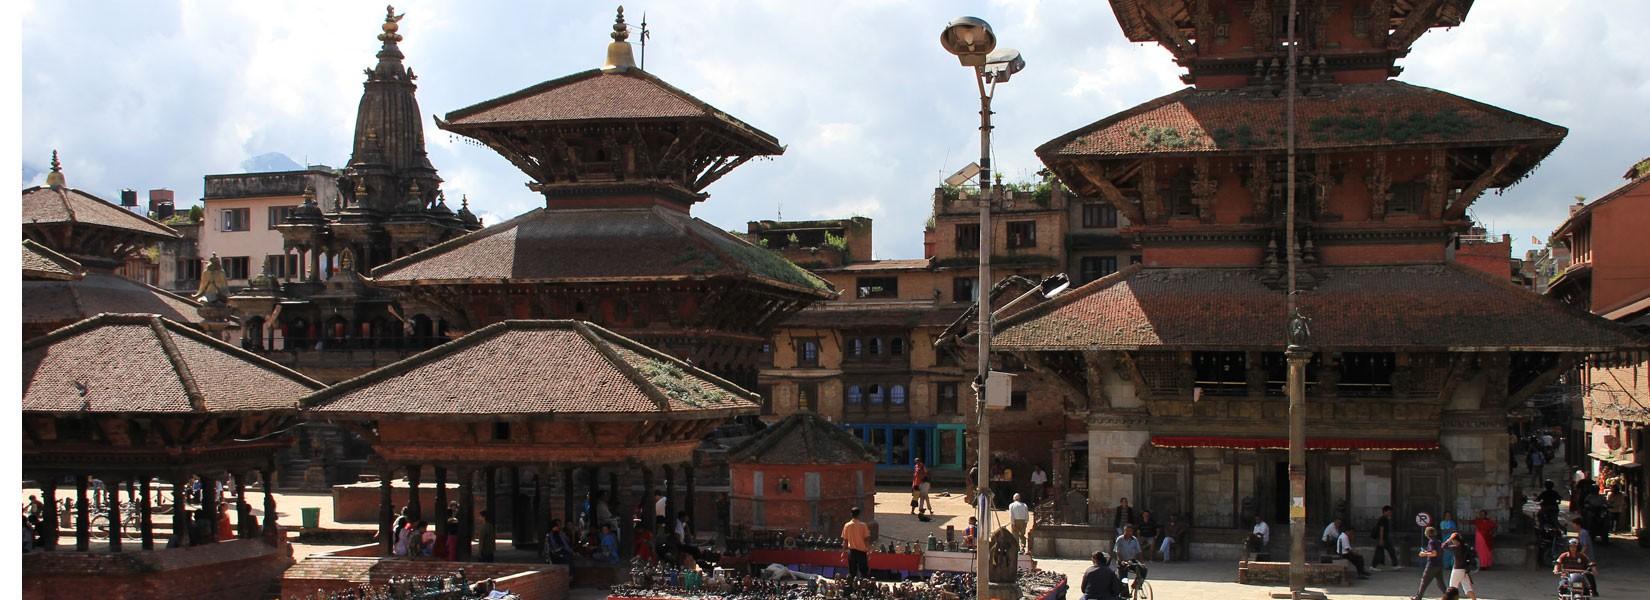 1 Day Kathmandu City Sightseeing